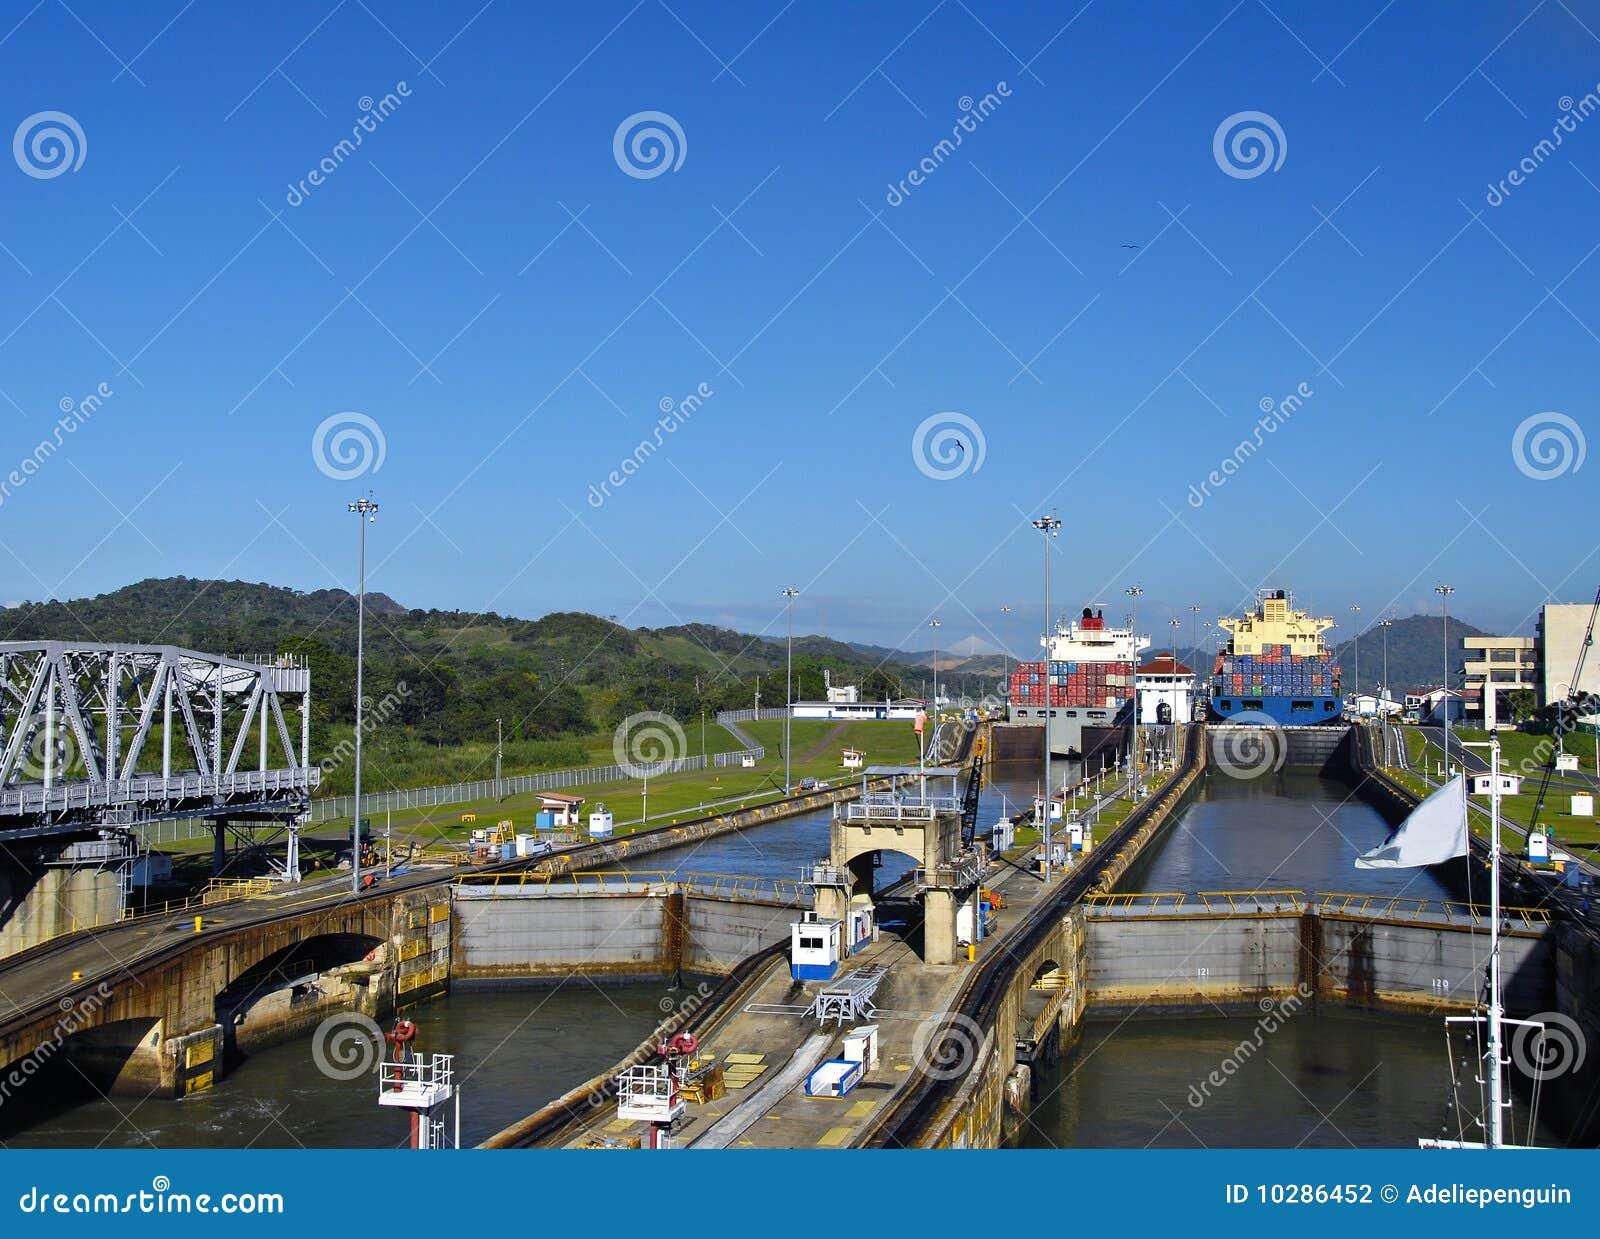 Through the Locks, Panama Canal